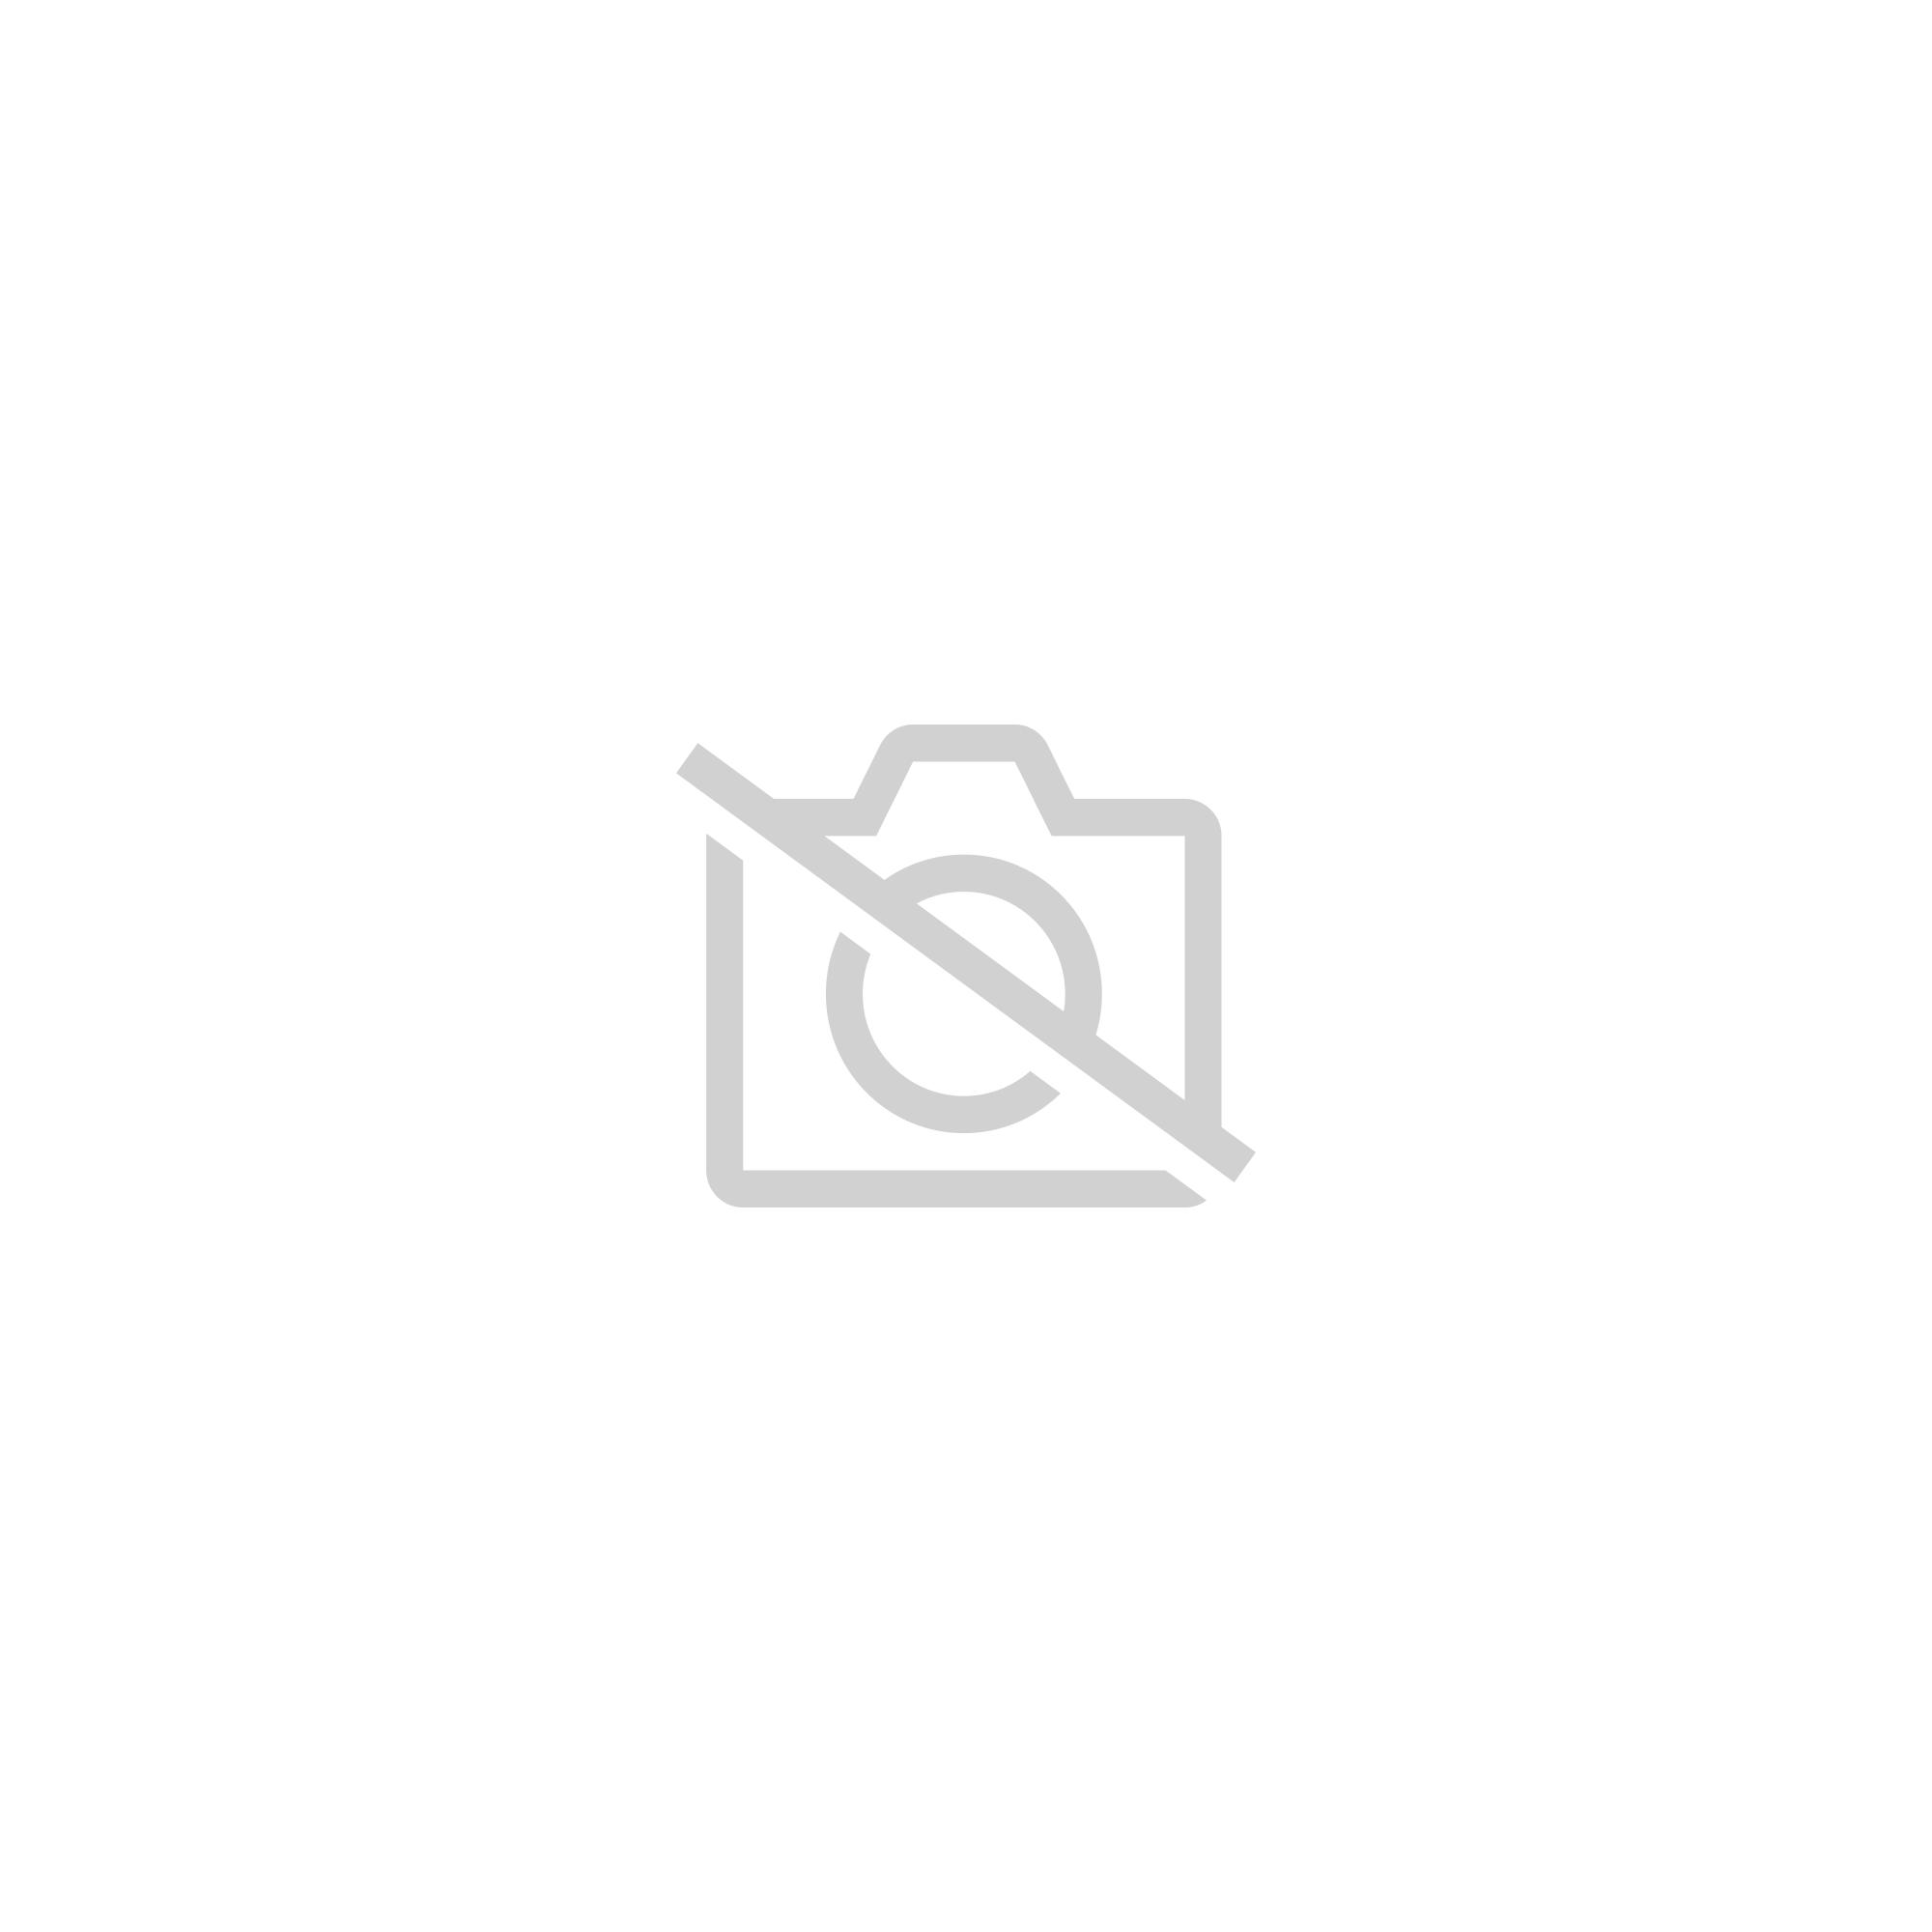 Emporio Armani - Tshirt Manches Longues - Homme - Underwear 111023 5a725 - Noir Rouge